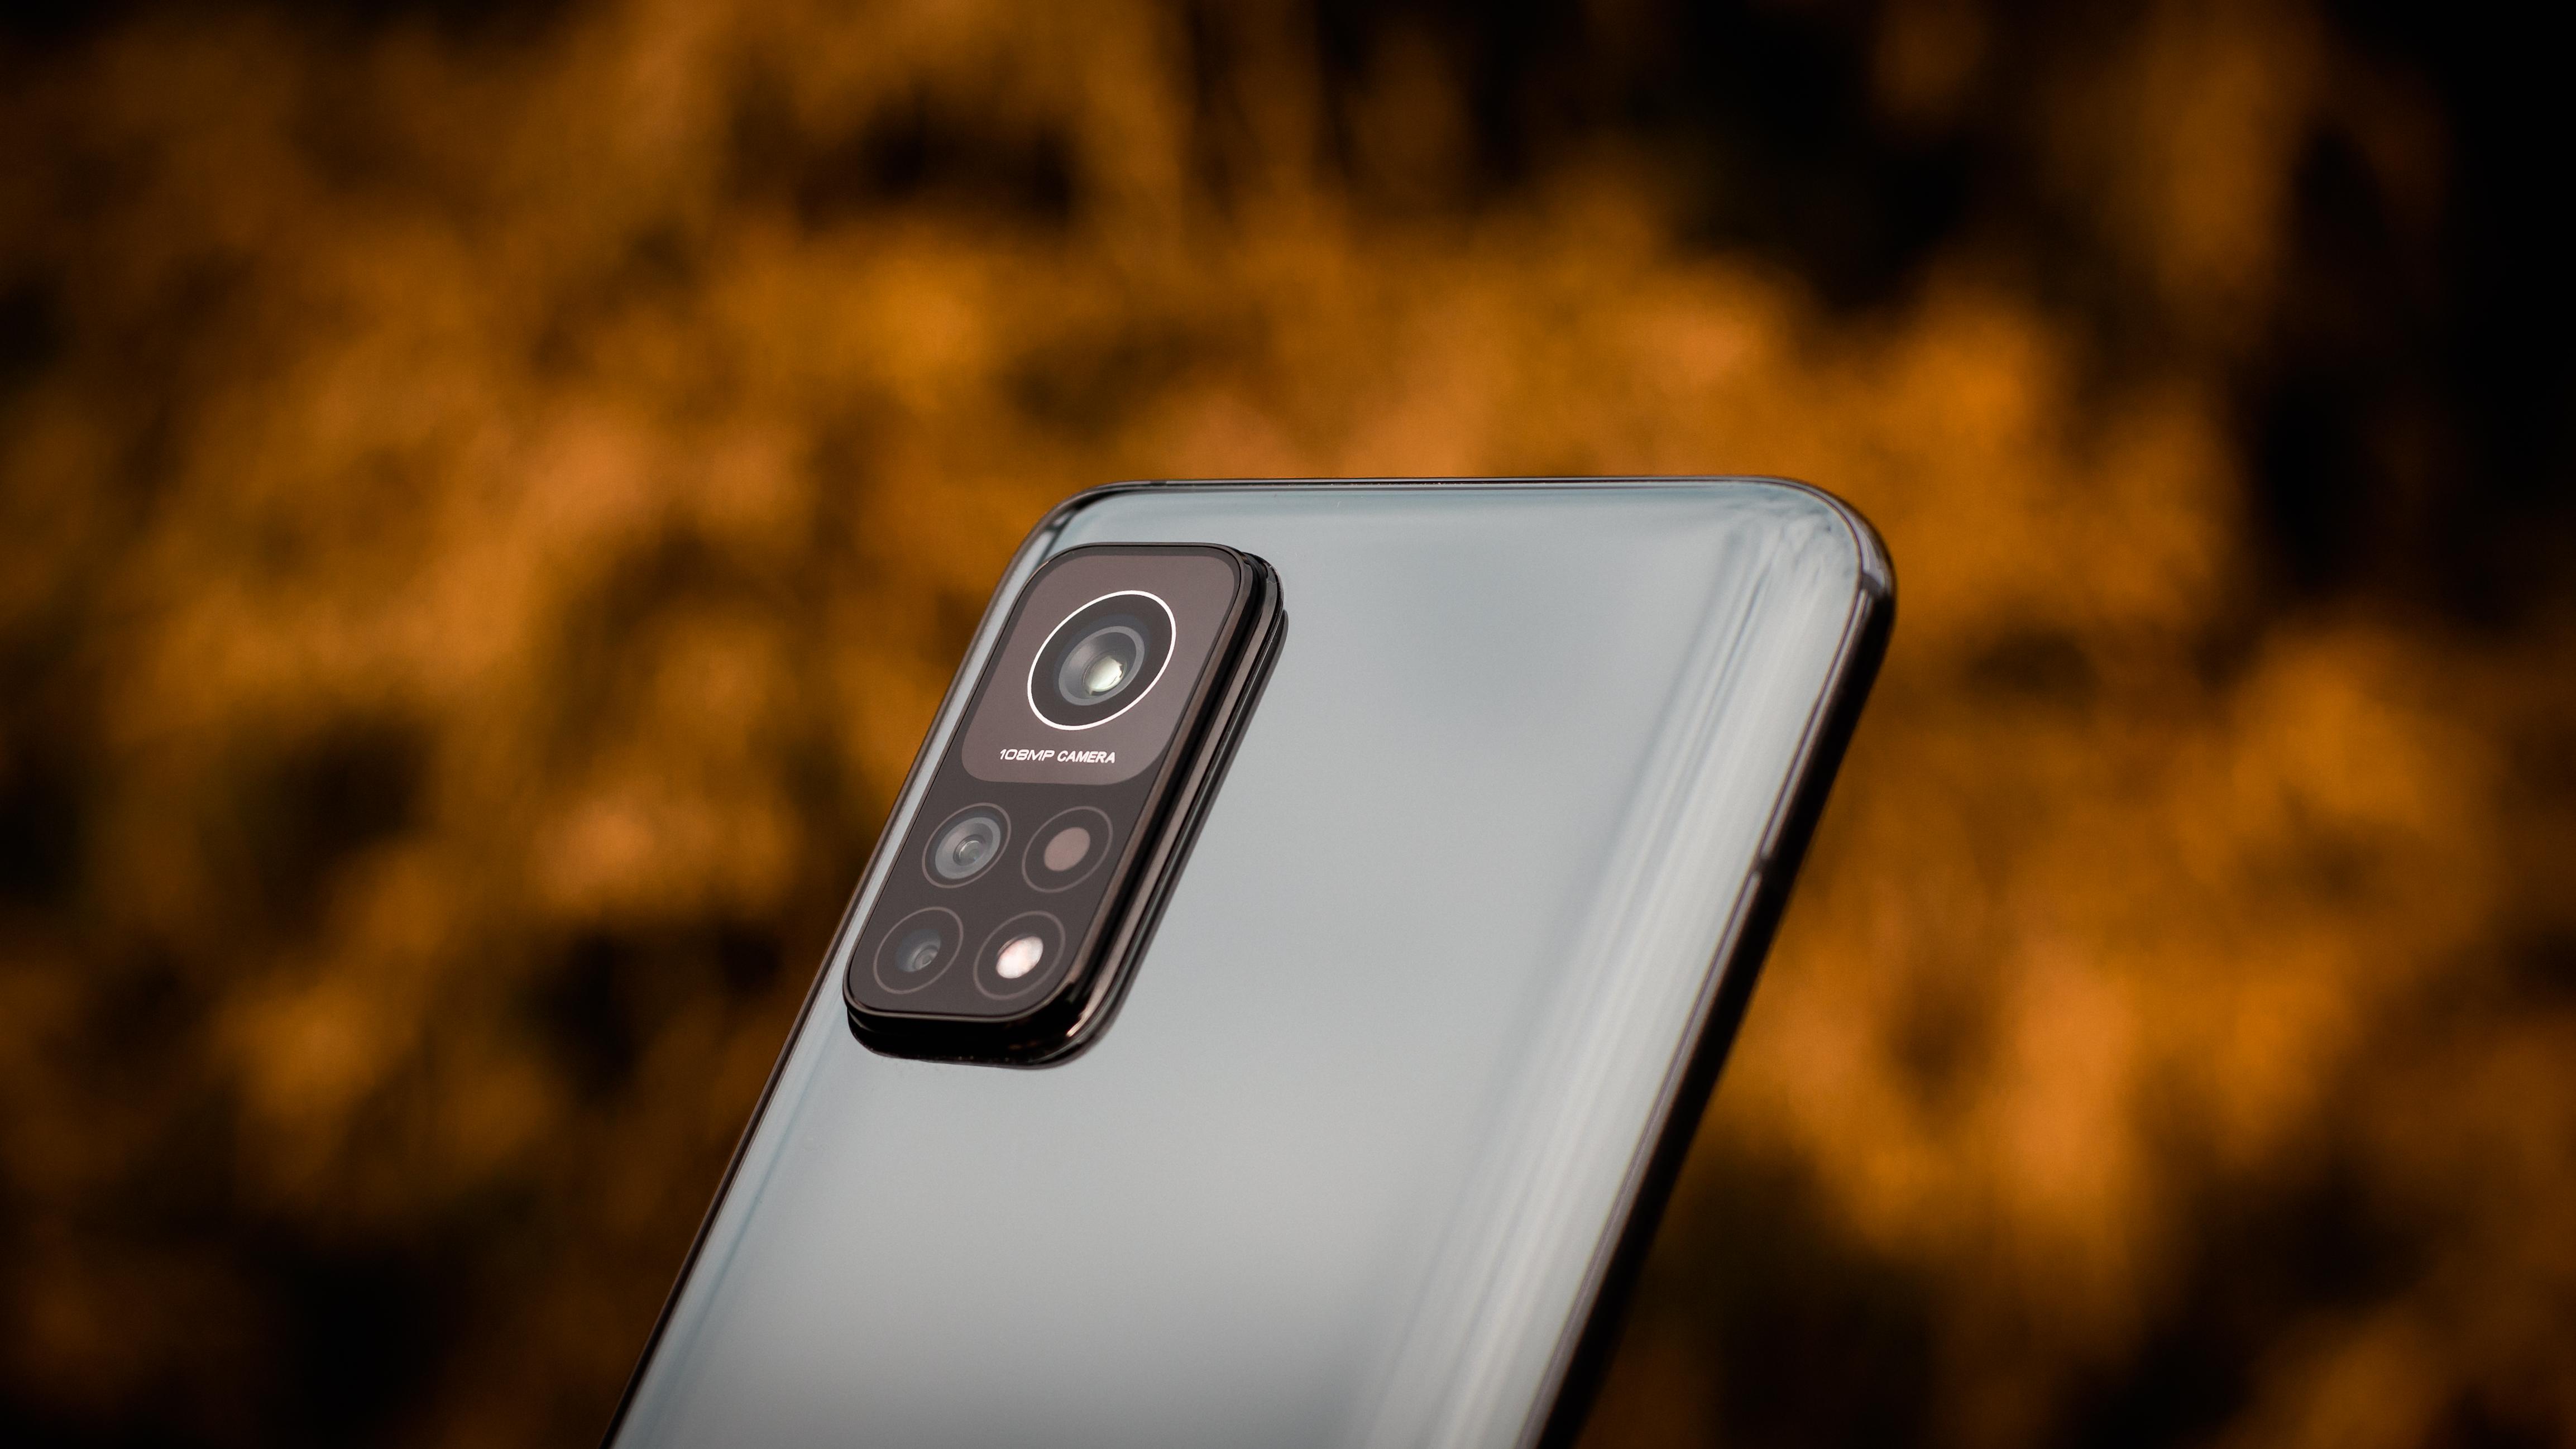 Xiaomi Mi 10T Pro fot. Miłosz Starzewski